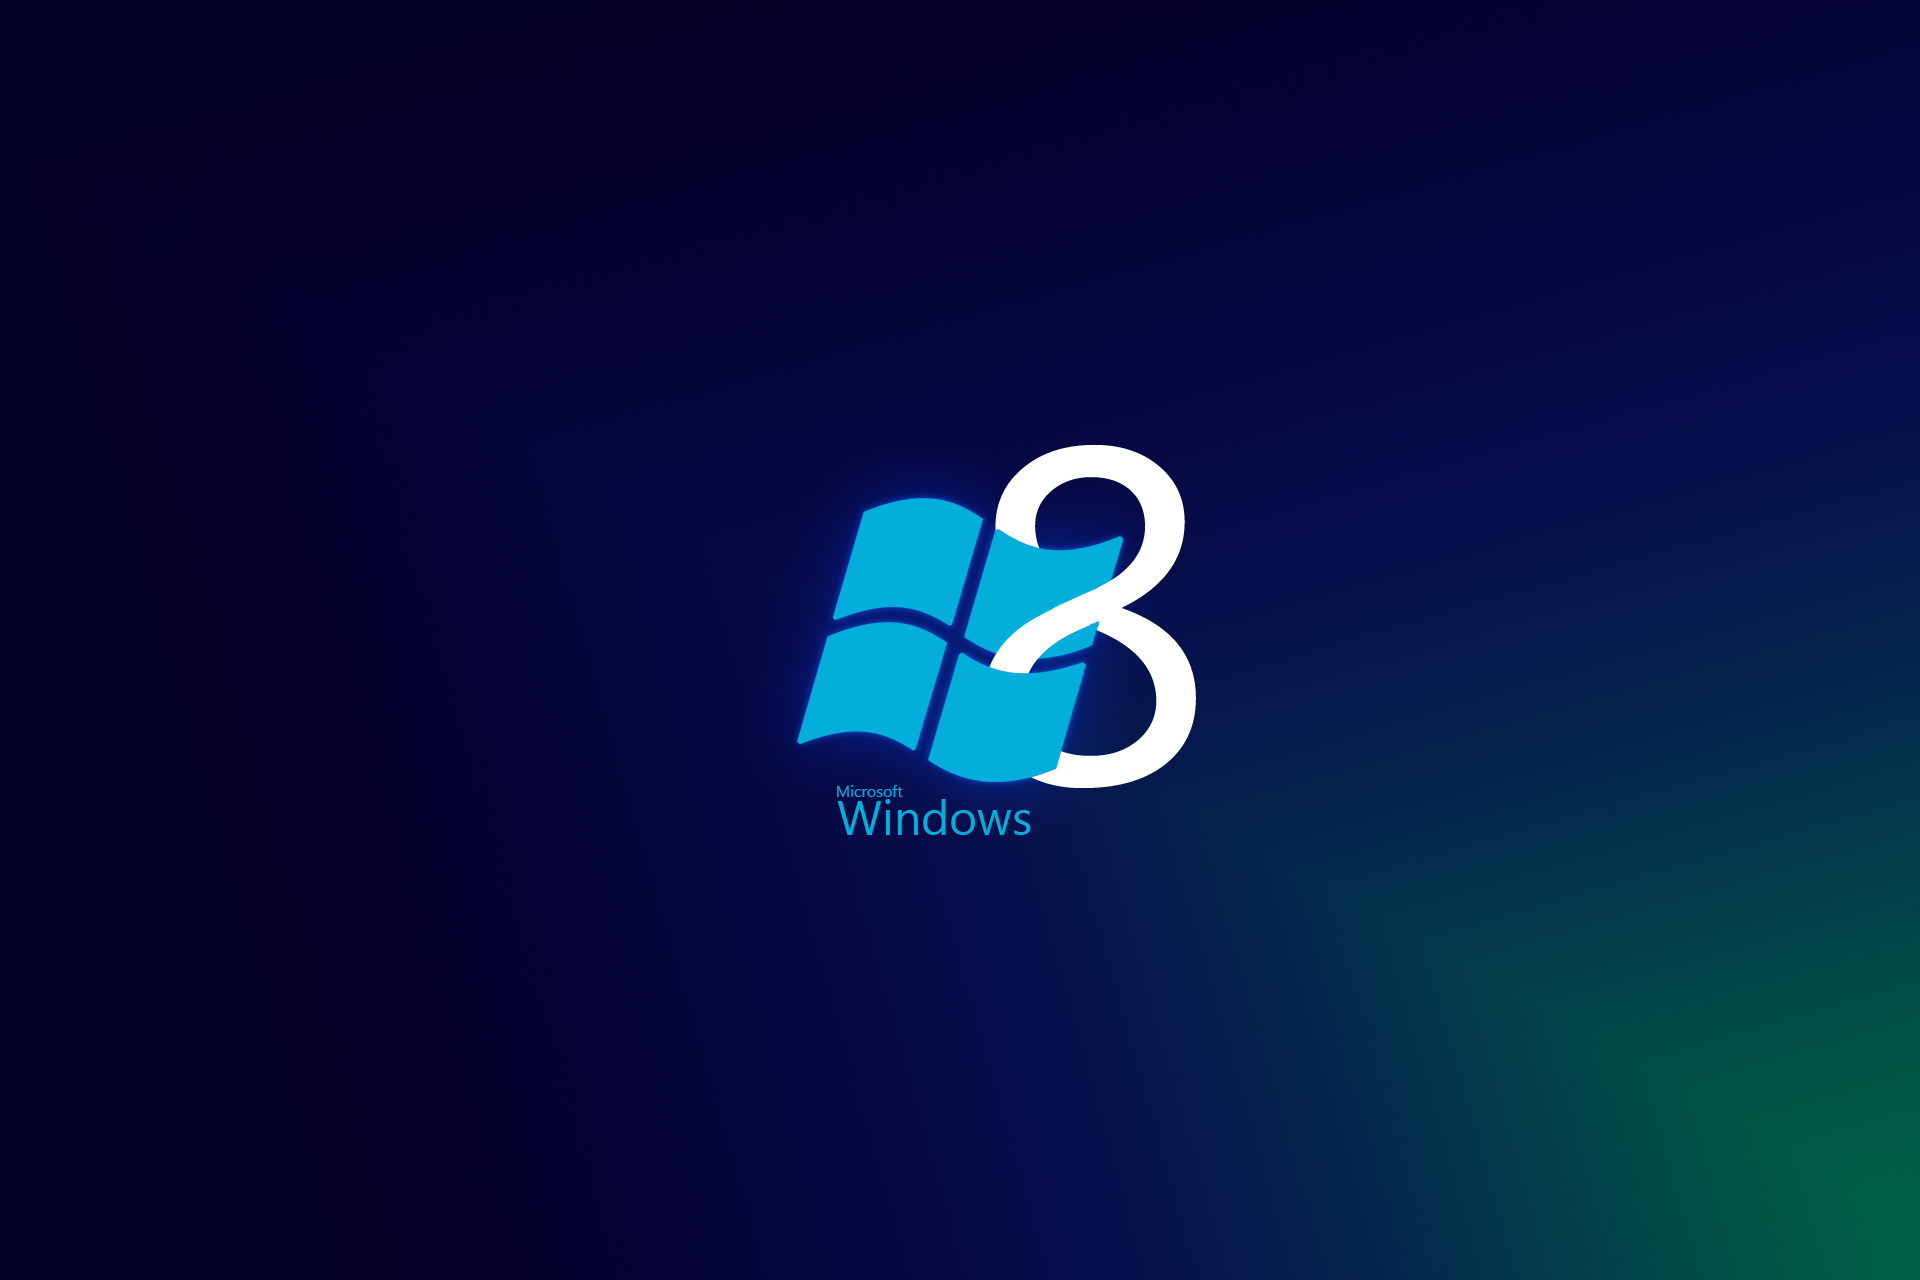 Windows 8 Wallpapers 08